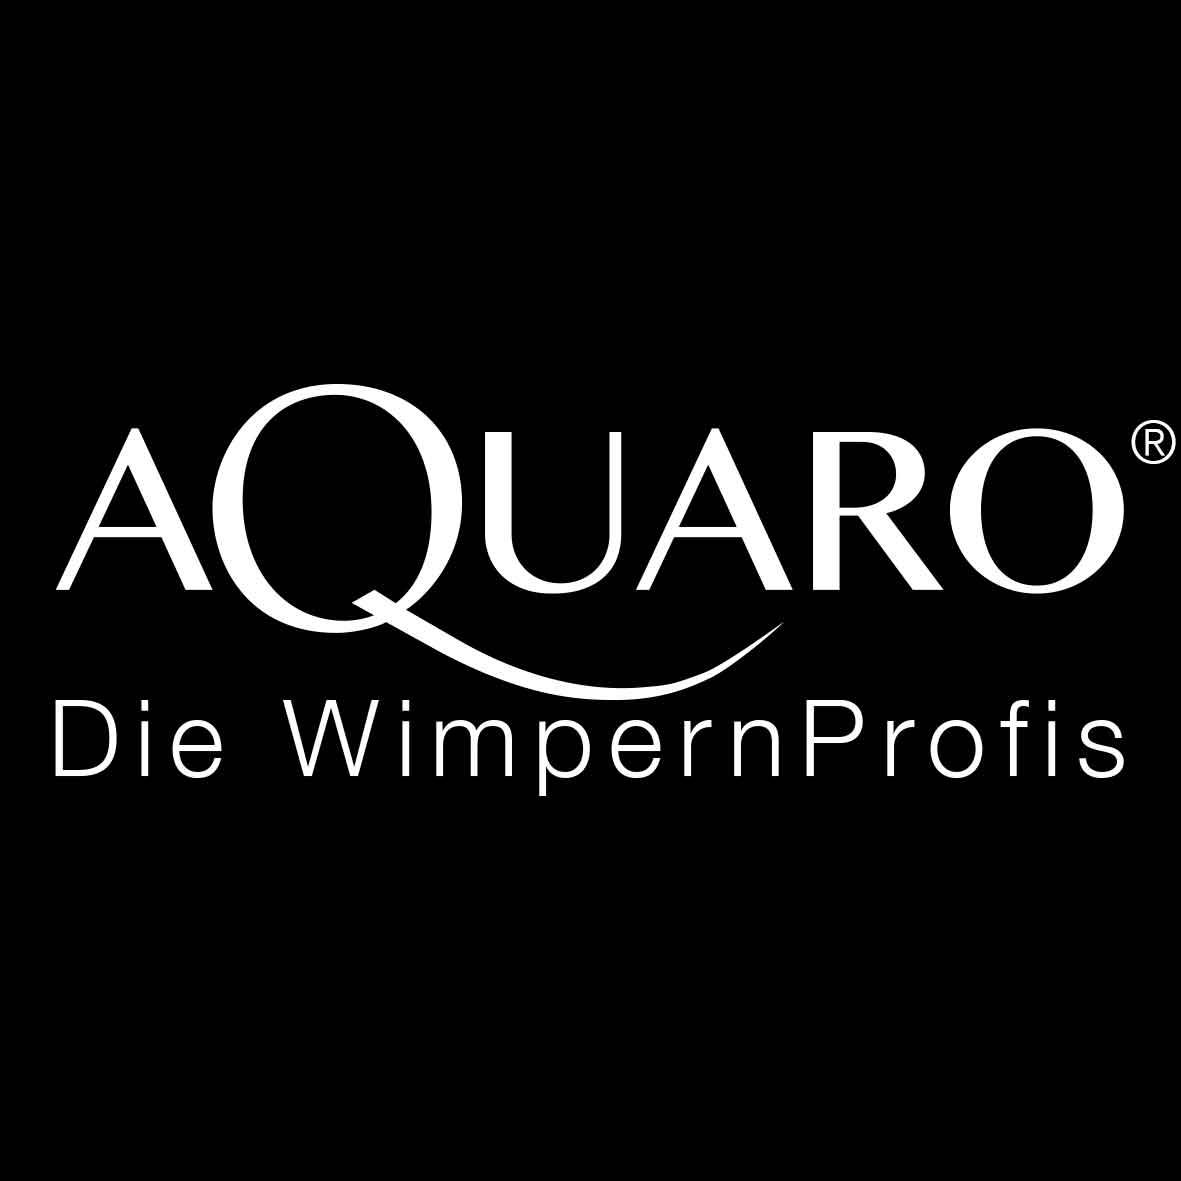 Aquaro-die-wimpernprofis5a_aquarodesign